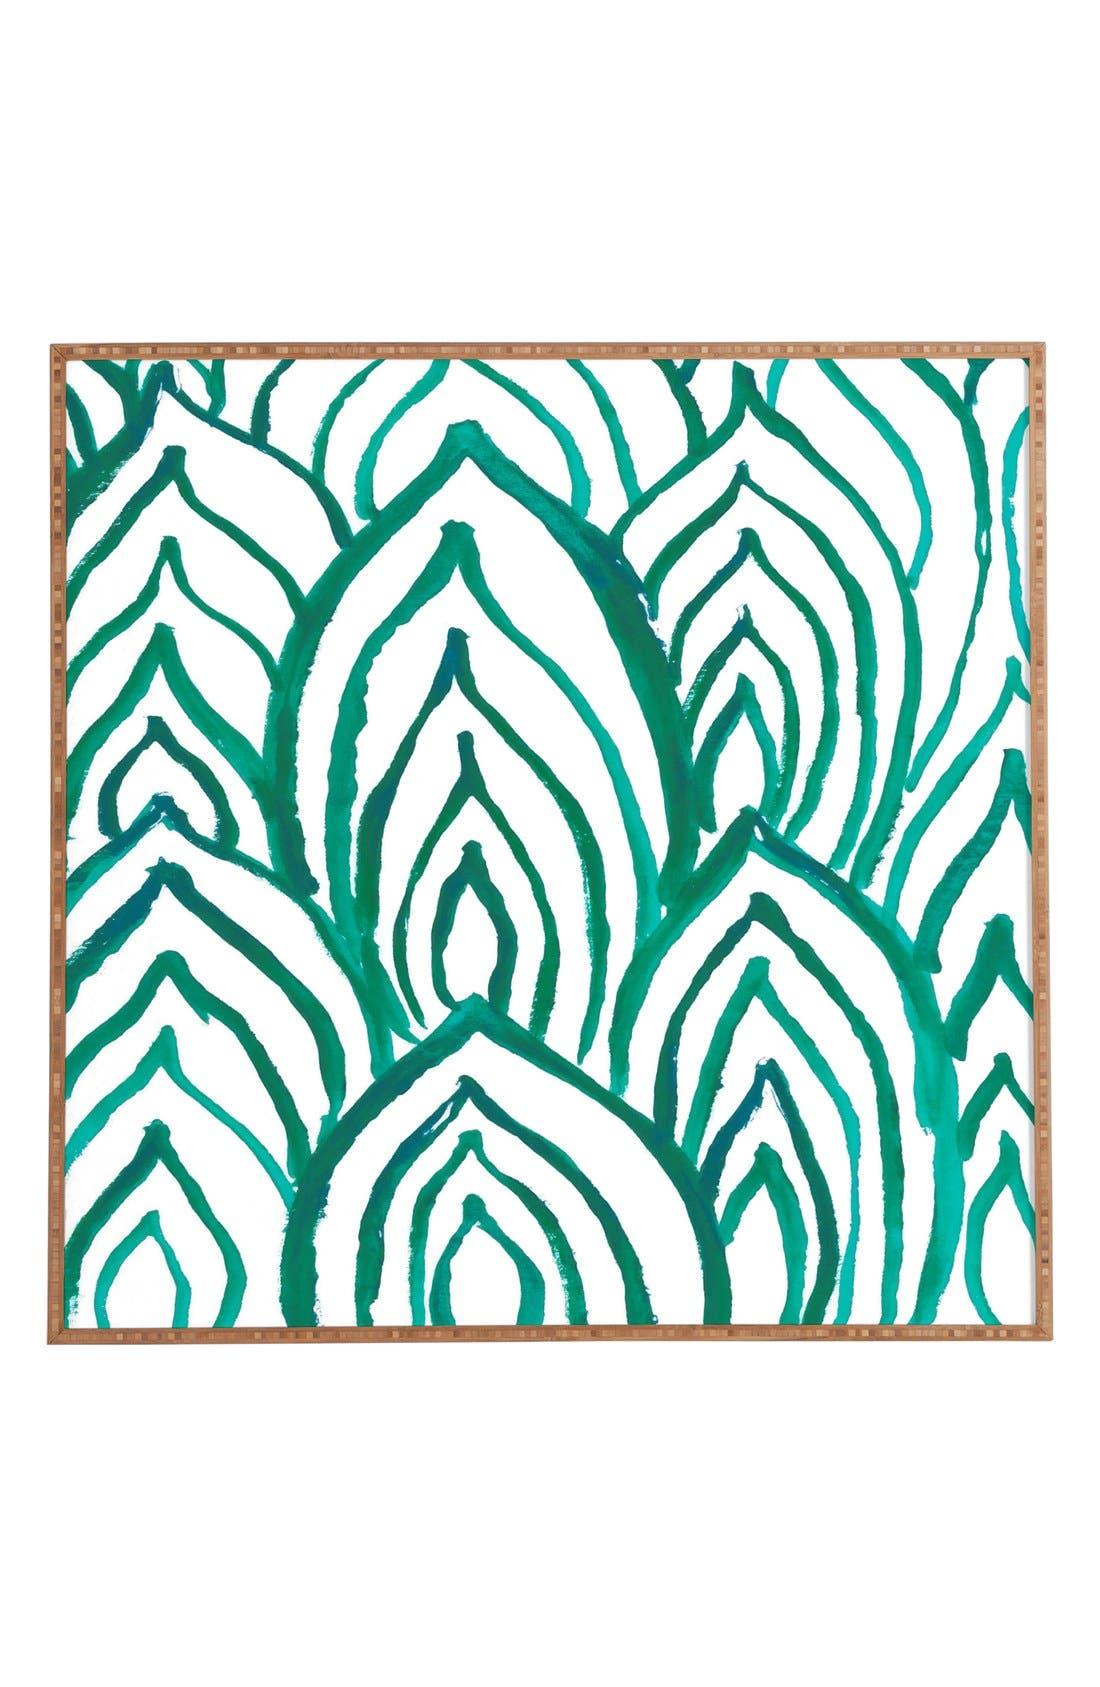 Alternate Image 1 Selected - DENY Designs 'Emerald Coast' Framed Wall Art